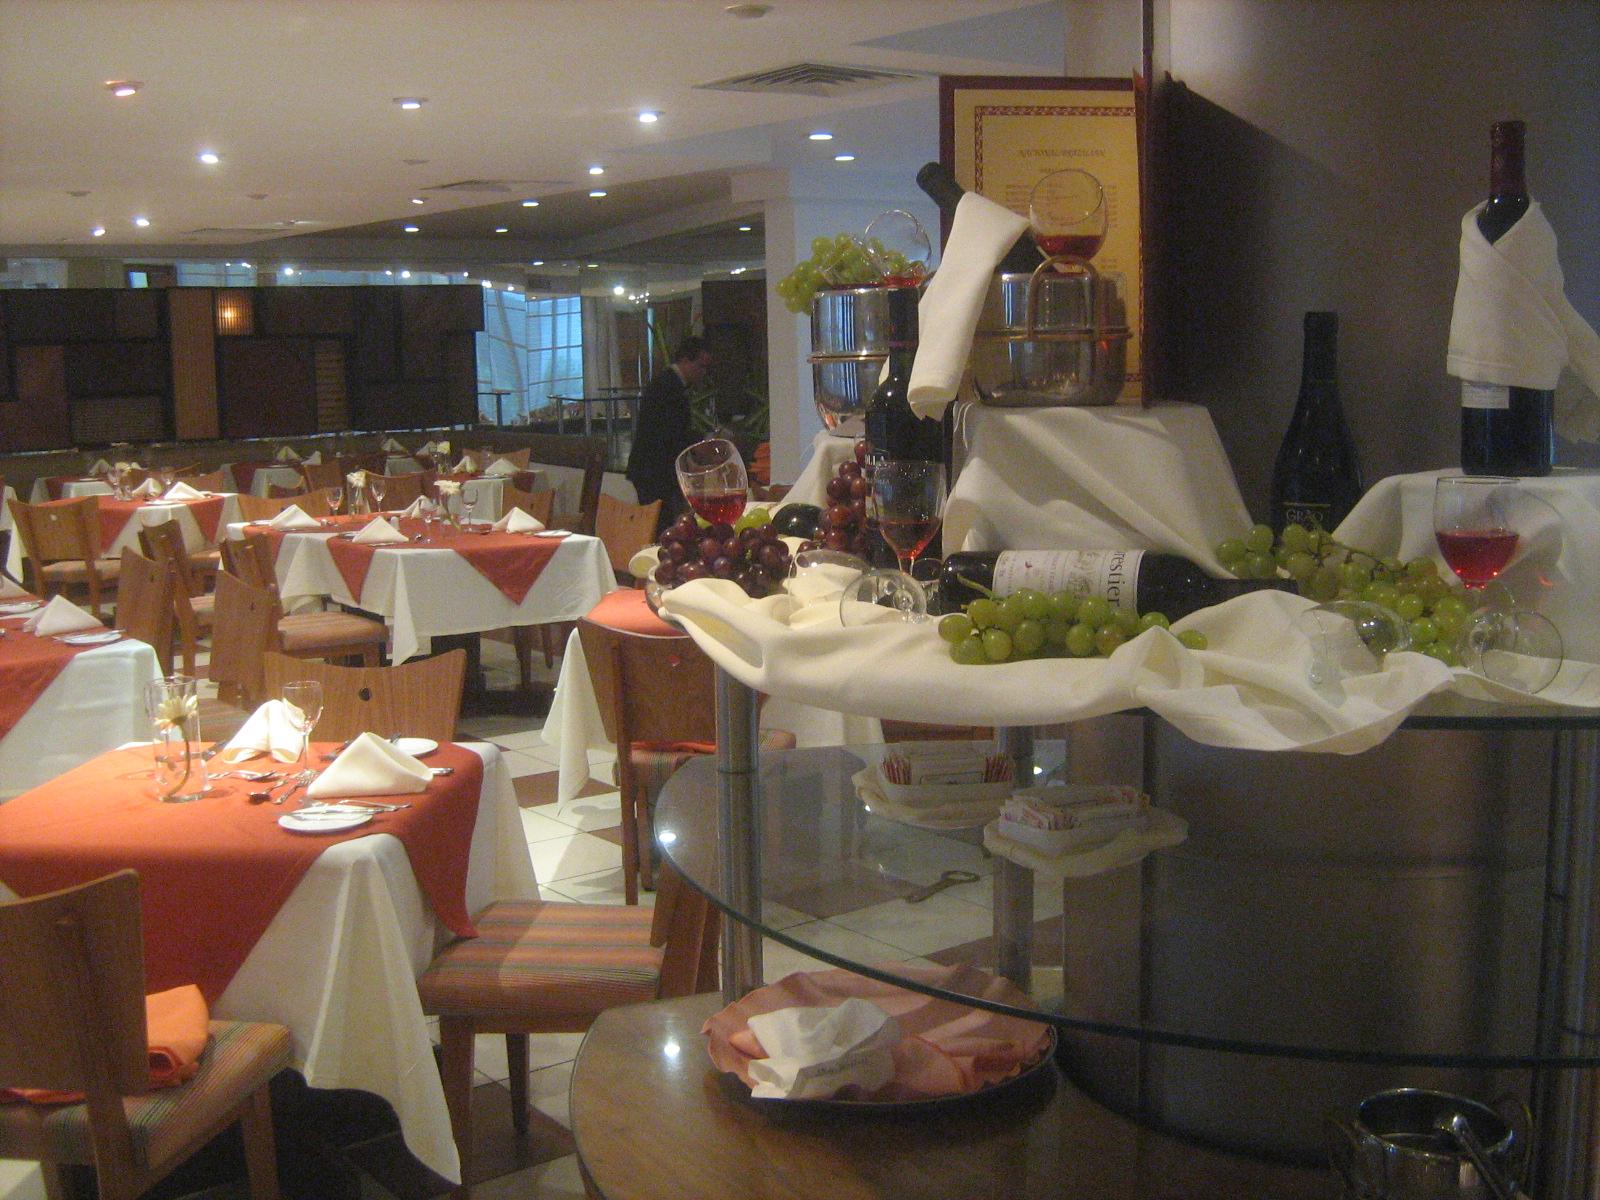 Hotel Internacional Palace Recife PE #2474A7 1600 1200